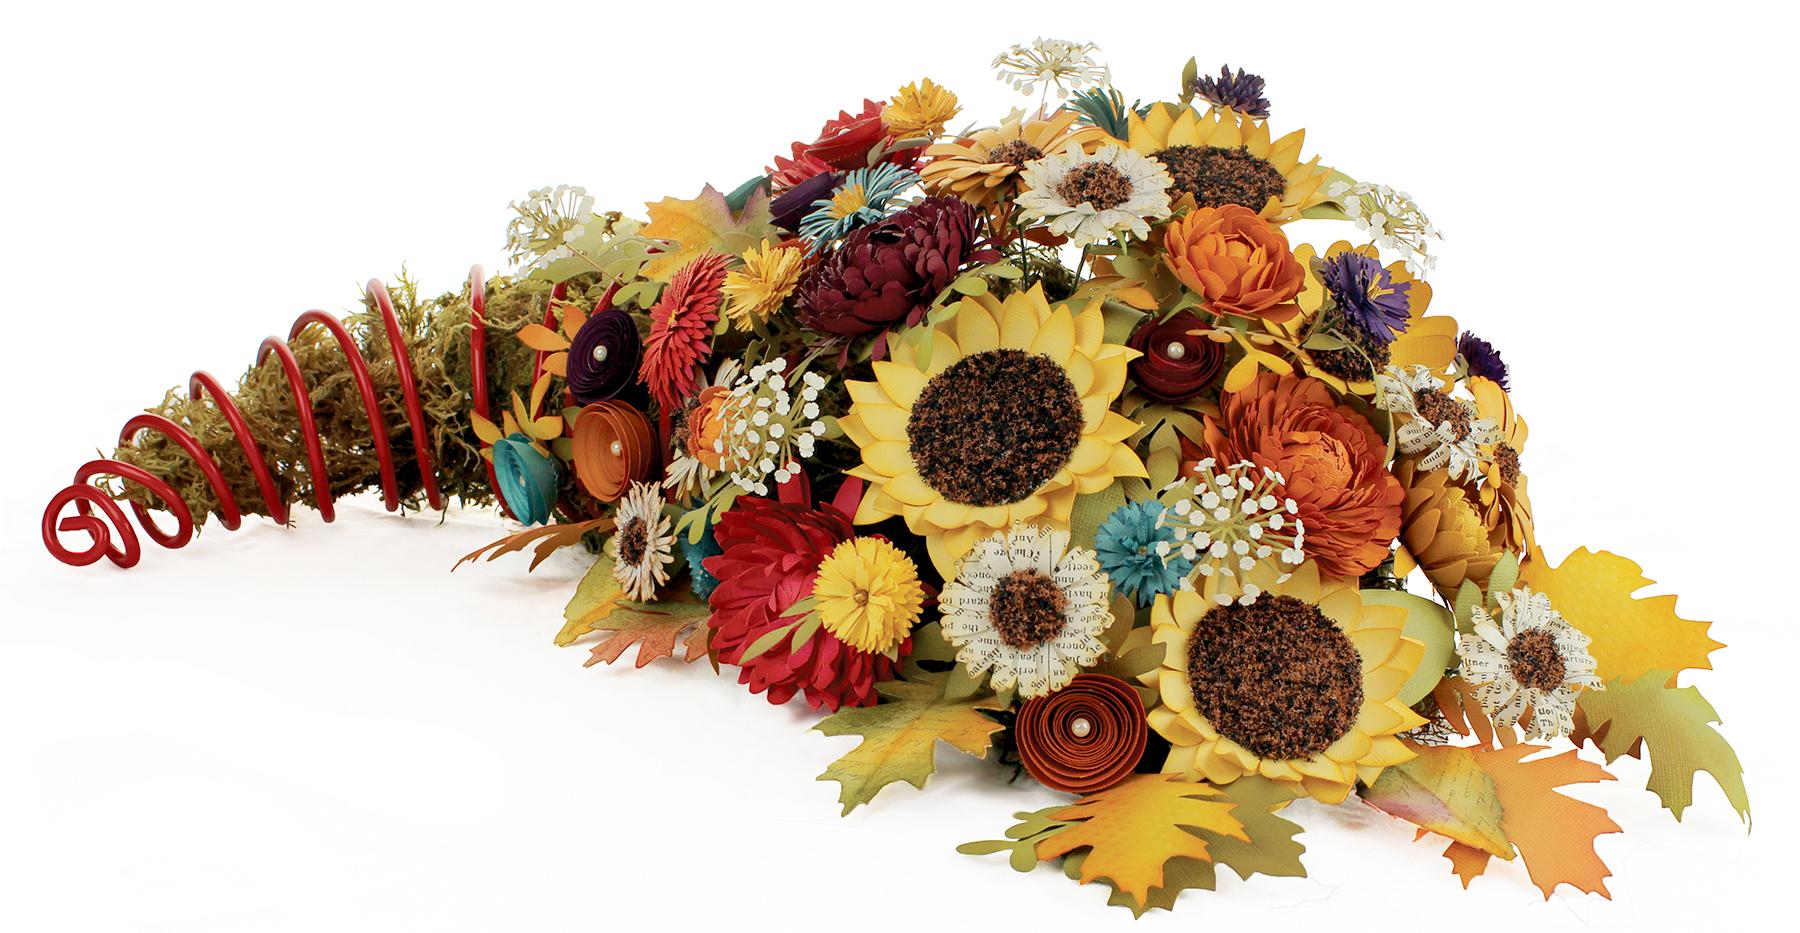 How to scrapbook flowers - Cornucopia